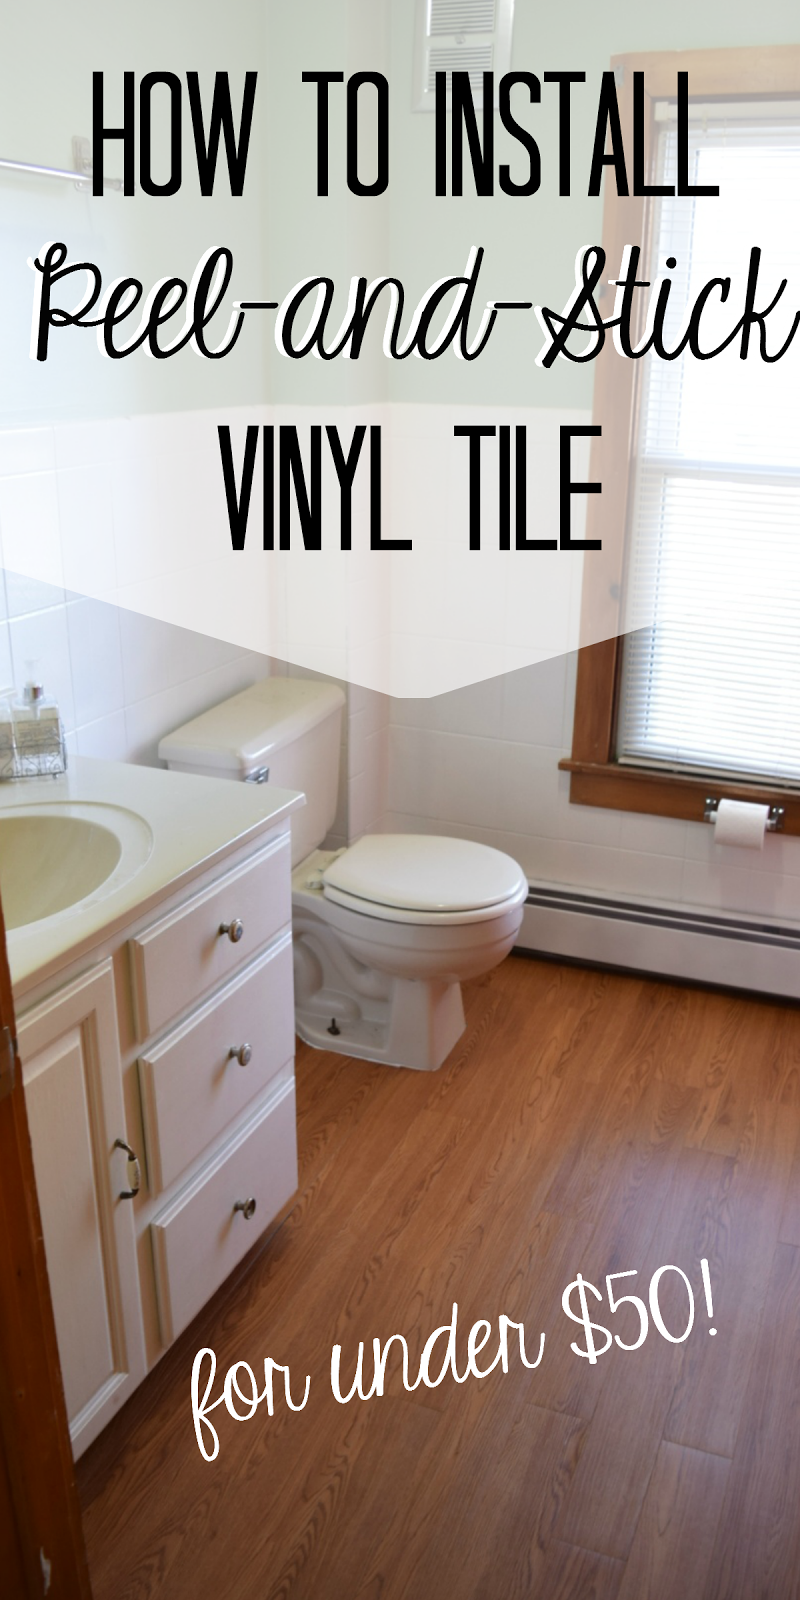 Install Peel-And-Stick Vinyl Floor Planks in the Bathroom ...